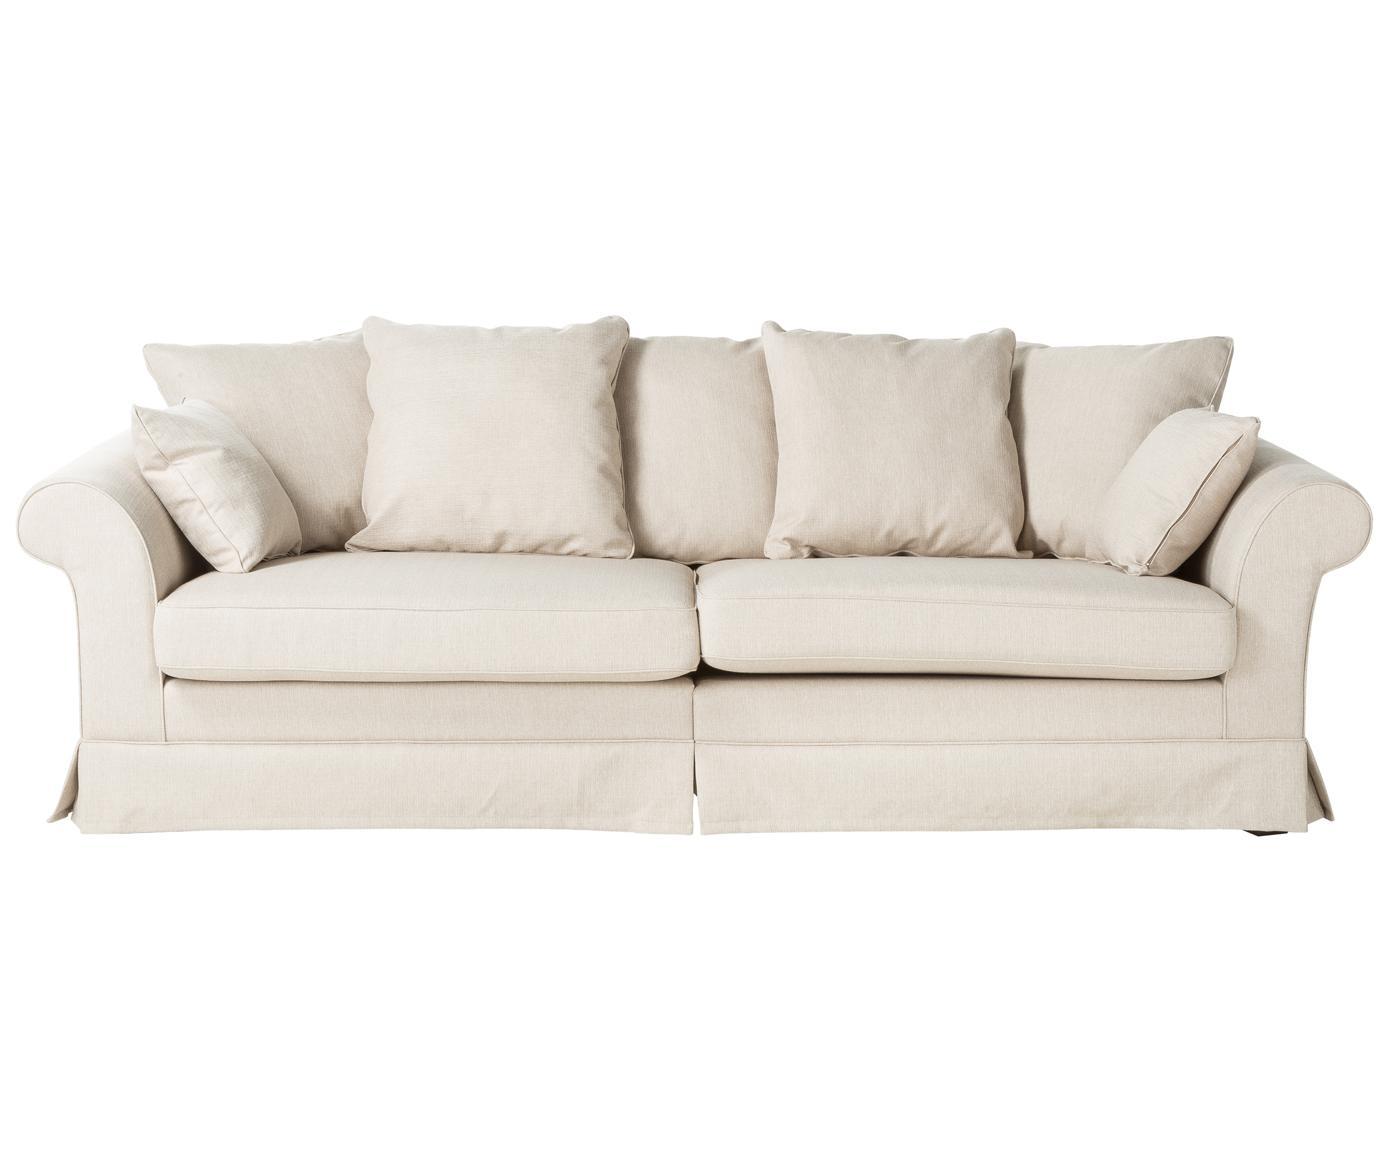 Hussen-Sofa Nobis, Bezug: Polyester, Webstoff Creme, B 264 cm